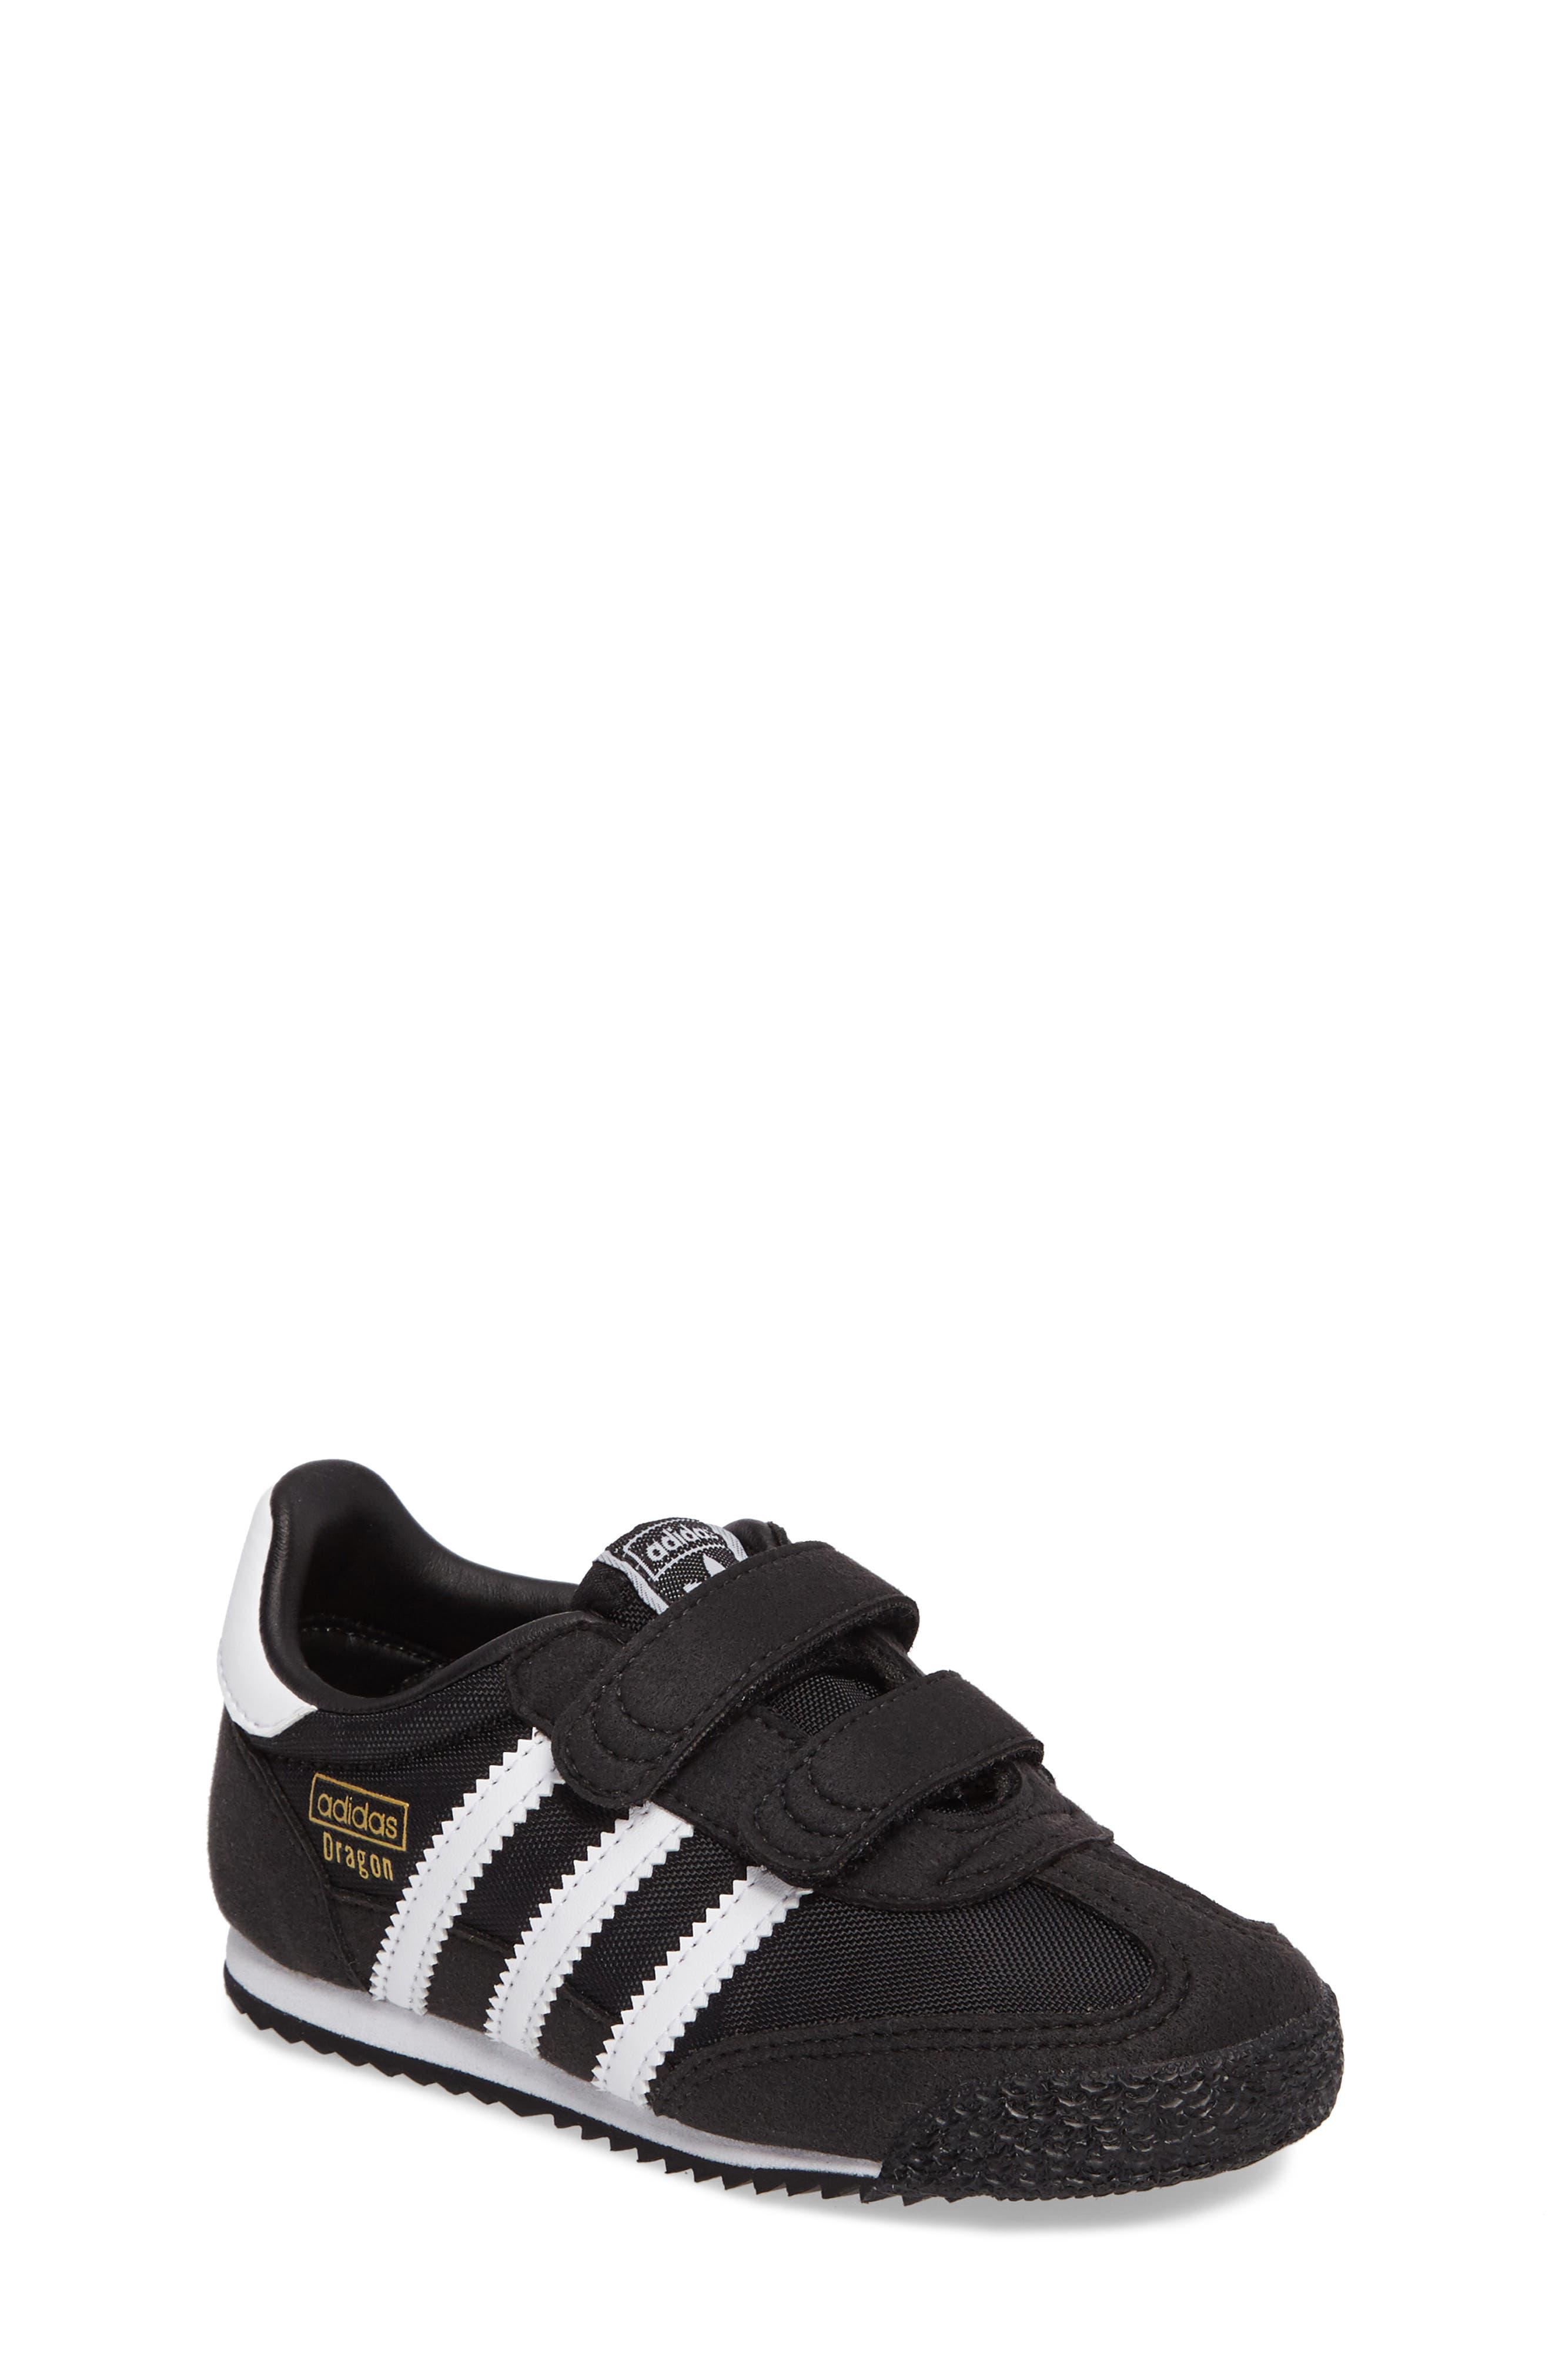 Main Image - adidas Dragon OG CF Athletic Shoe (Baby, Walker & Toddler)